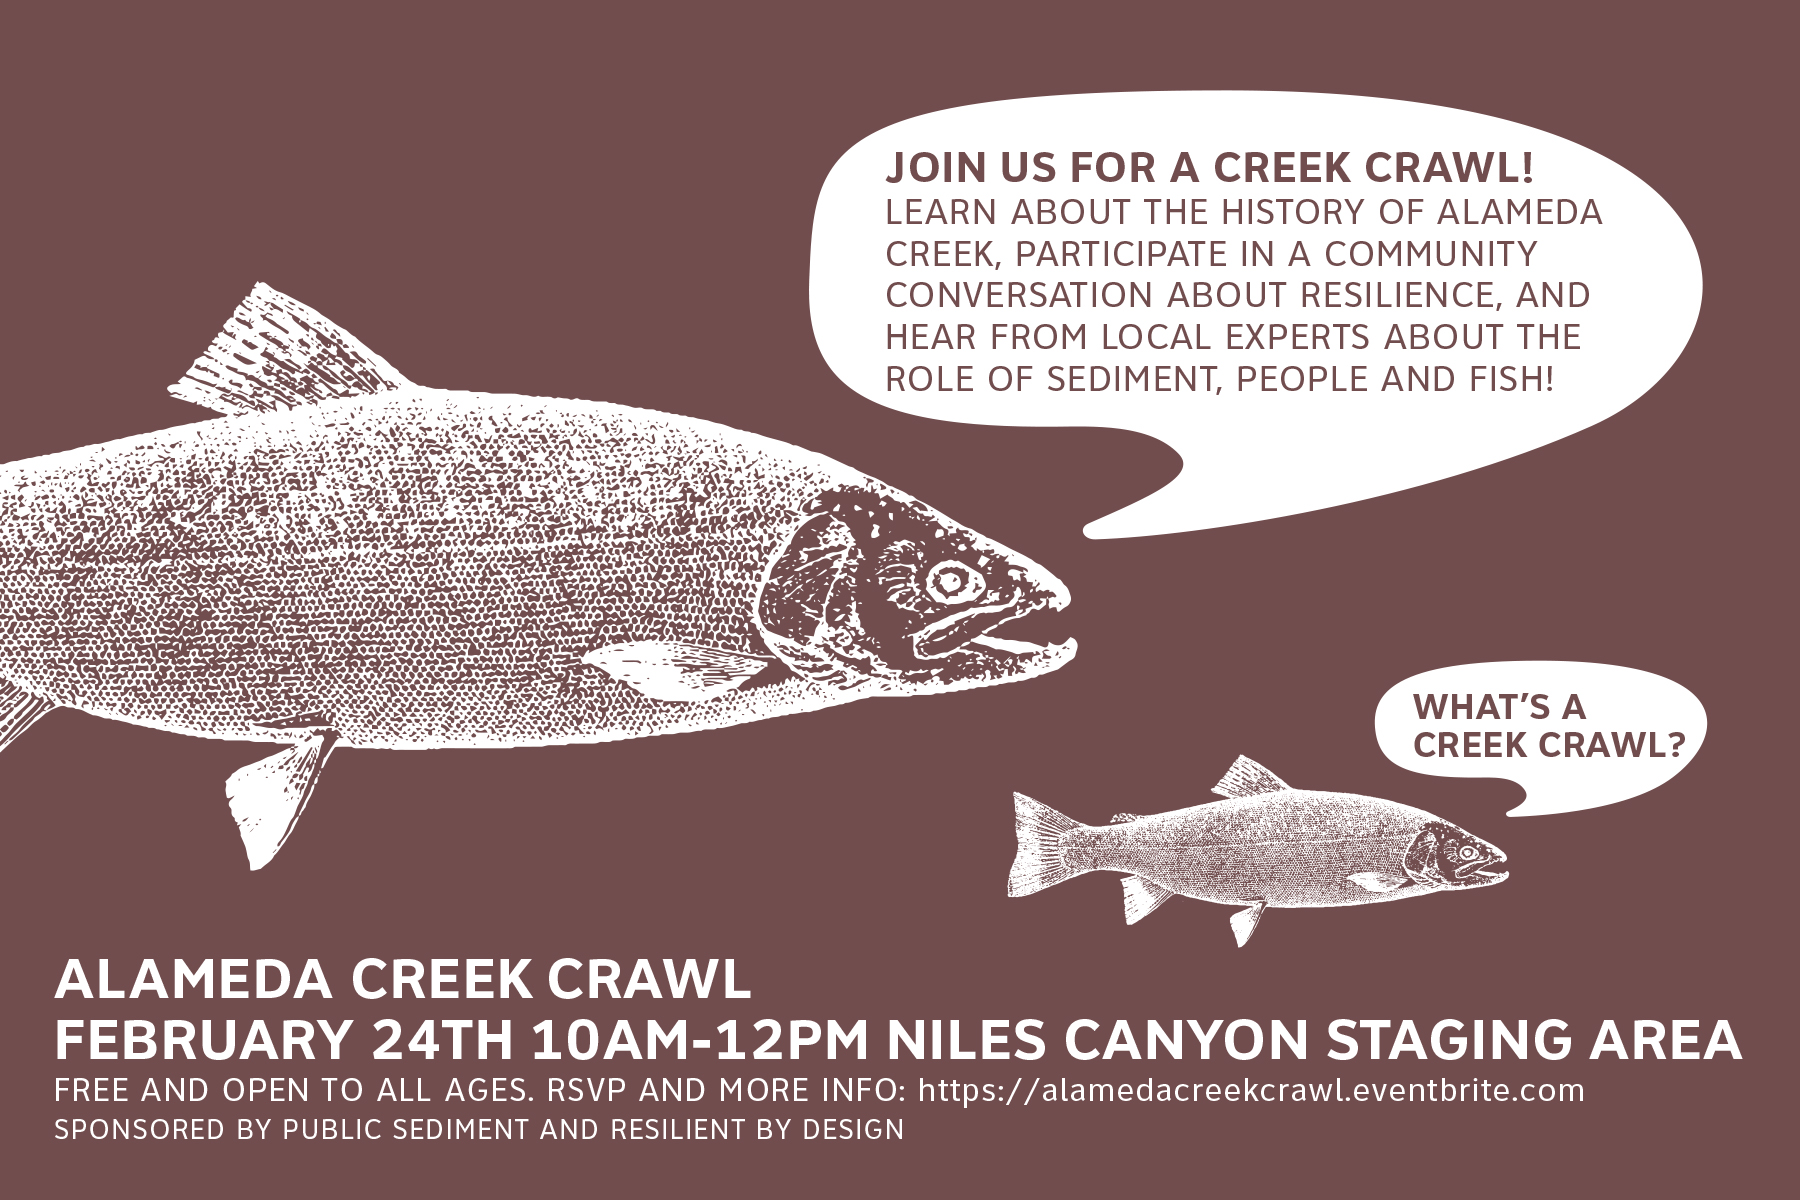 Creek Crawl Feb 24 (1).jpg